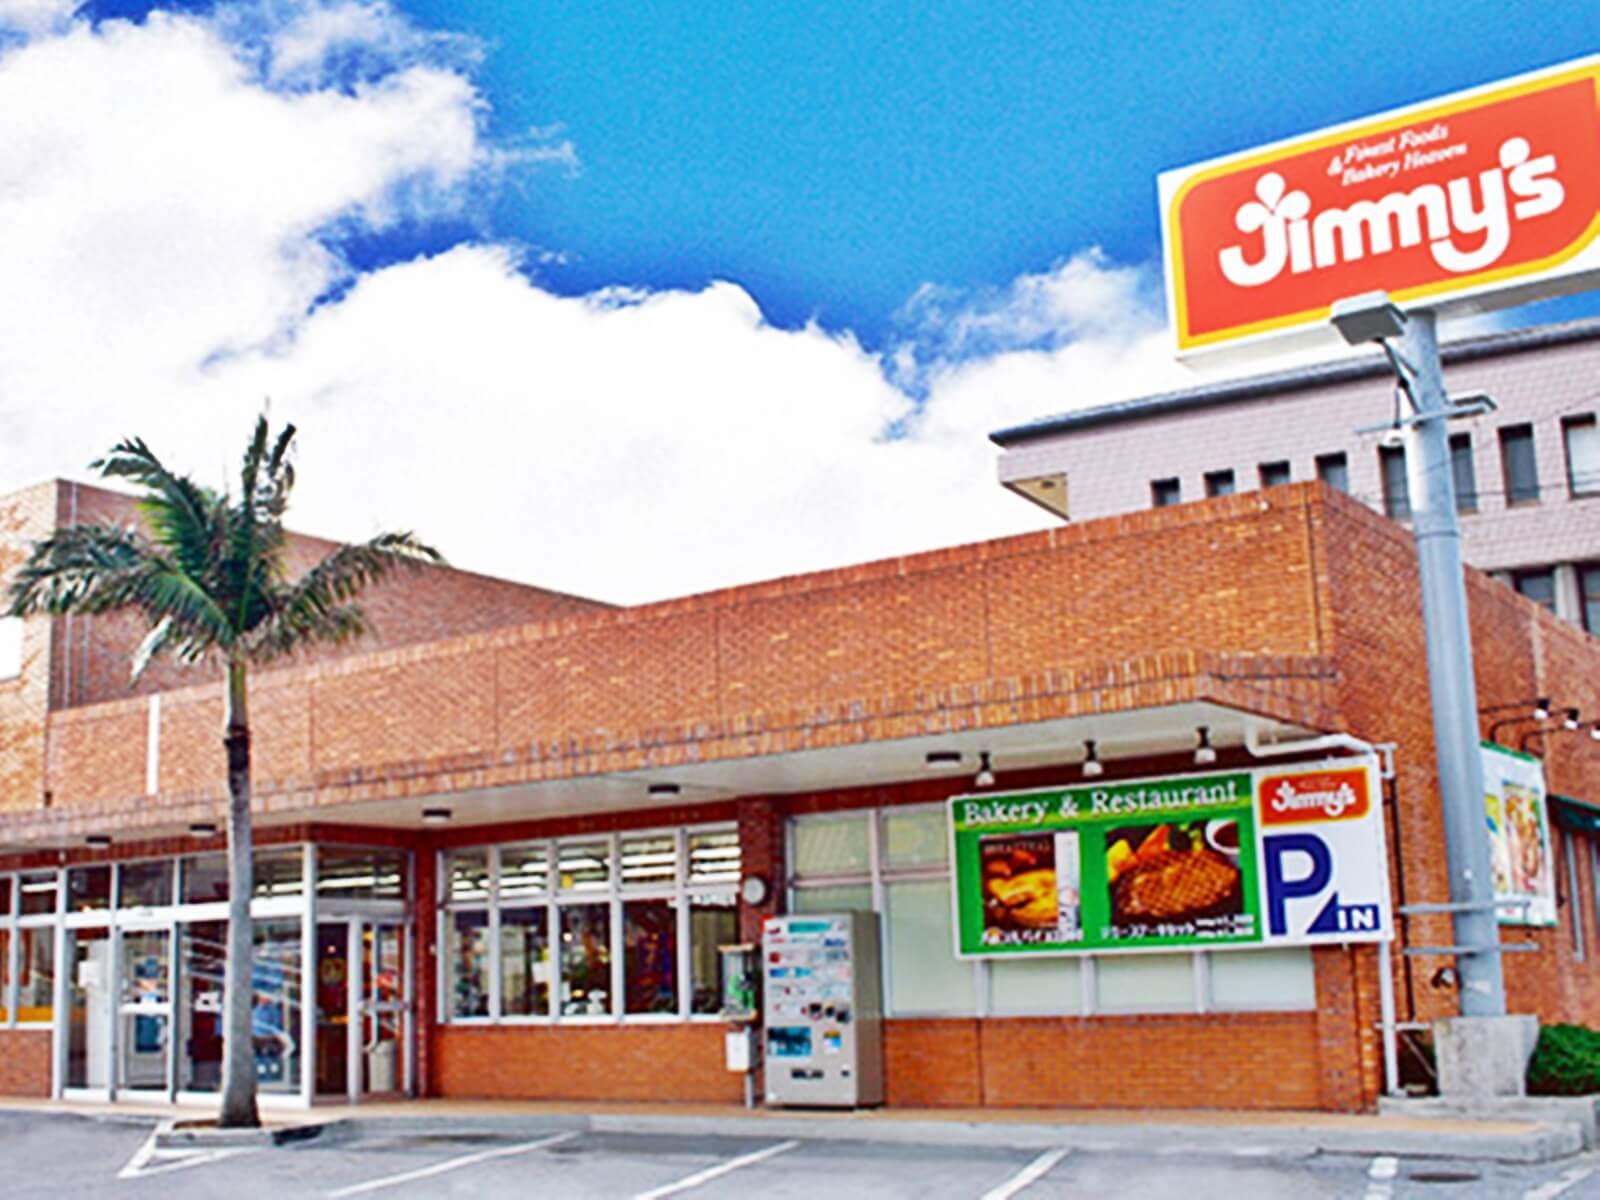 Jimmy's(ジミー)